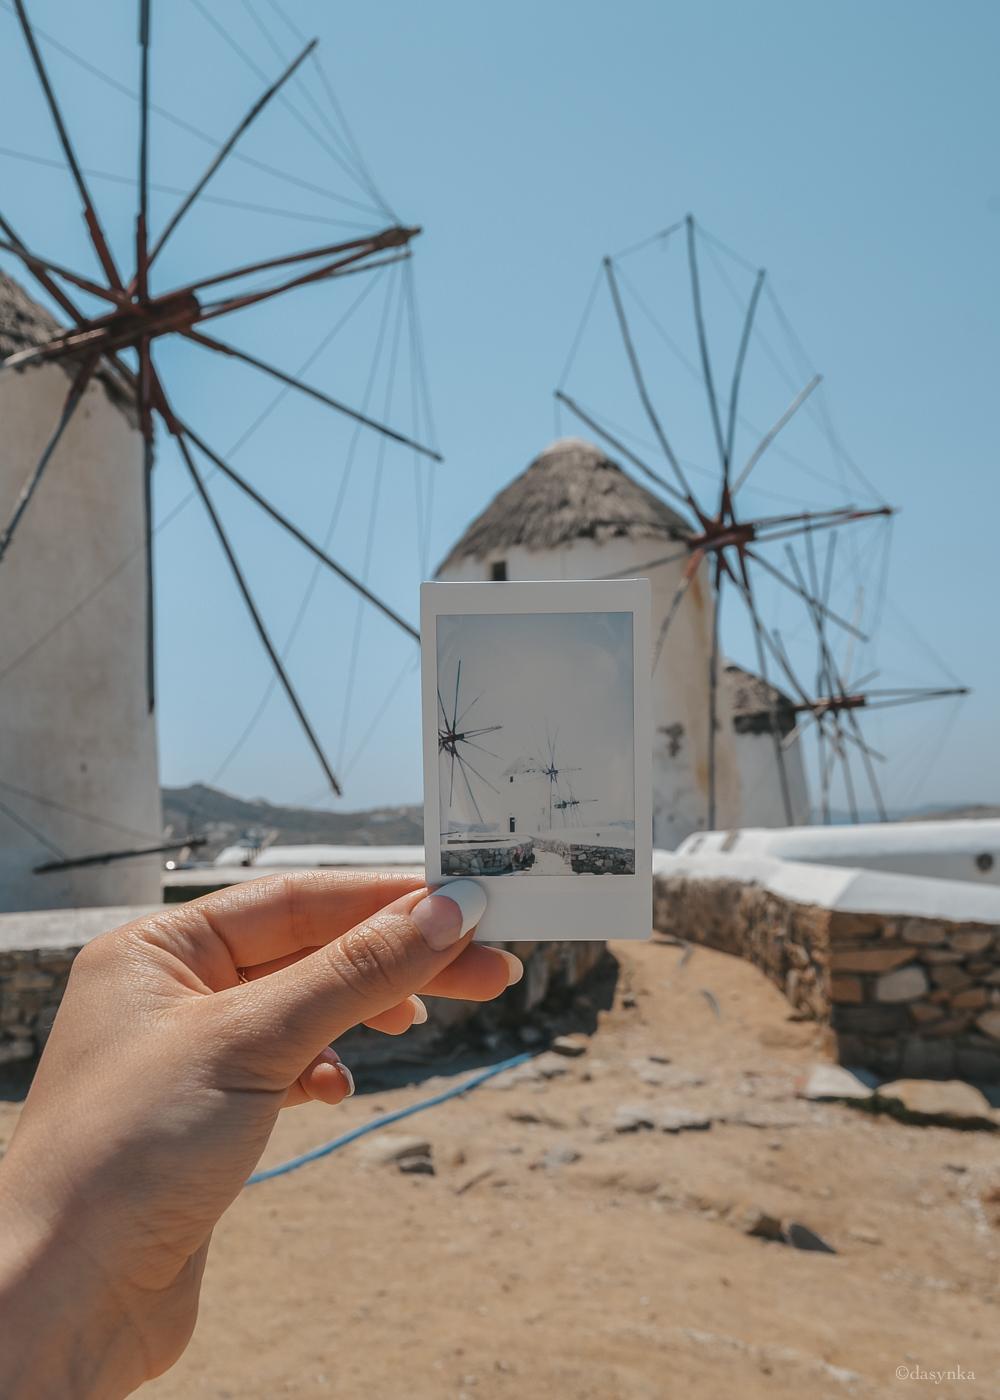 dasynka-fashion-blog-blogger-influencer-inspiration-shooting-globettrotter-travel-traveller-instagram-lifestyle-italy-ideas-italian-polaroids-polaroid-fujifilm-instax-90-8-worldmap-planisfero-mappa-mondo-pin-memories-photographs-vintage-print-mykonos-windmills